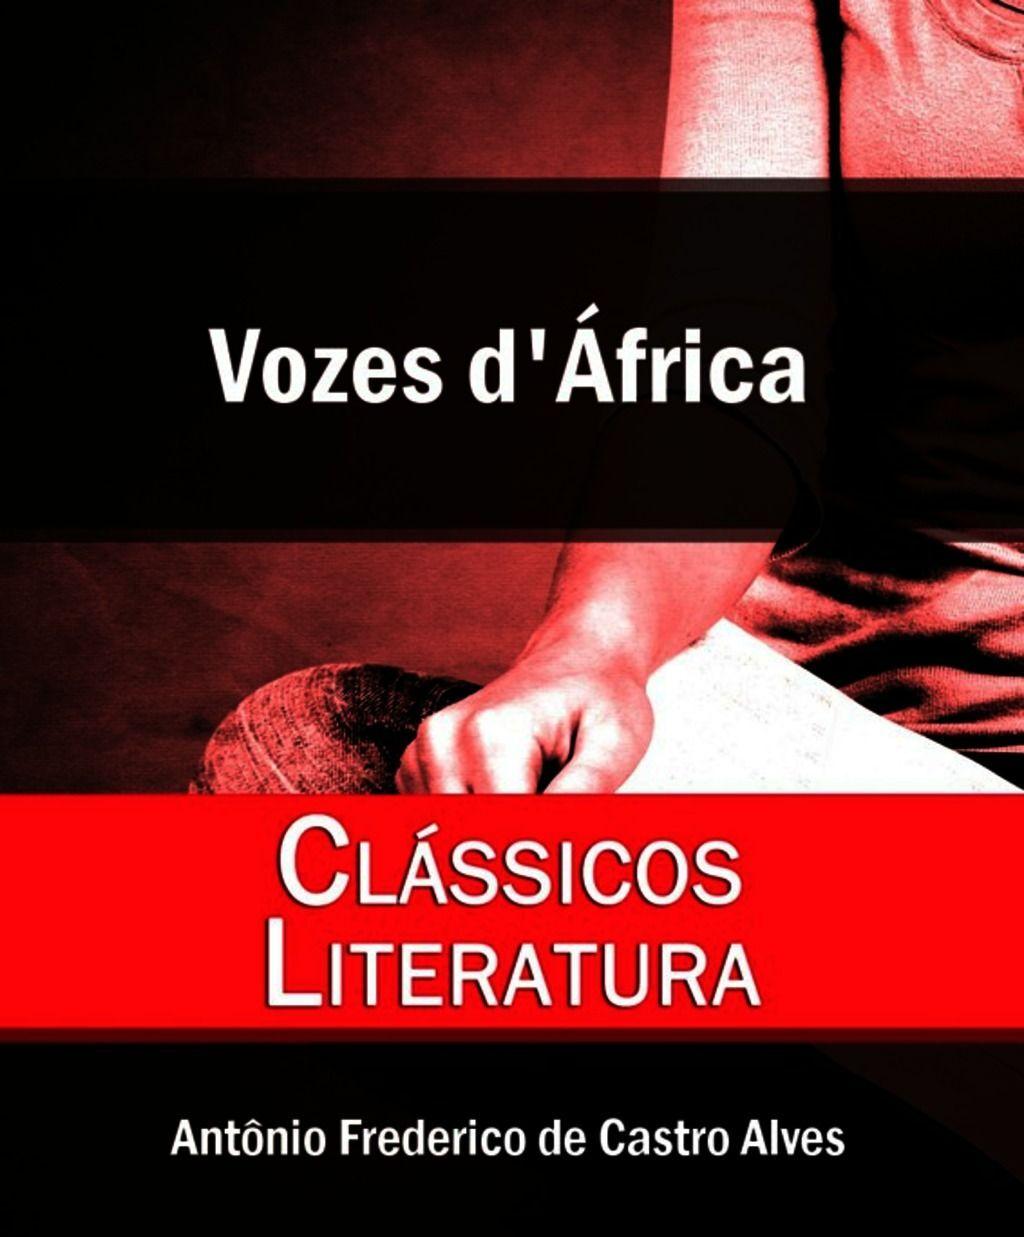 Vozes d'África